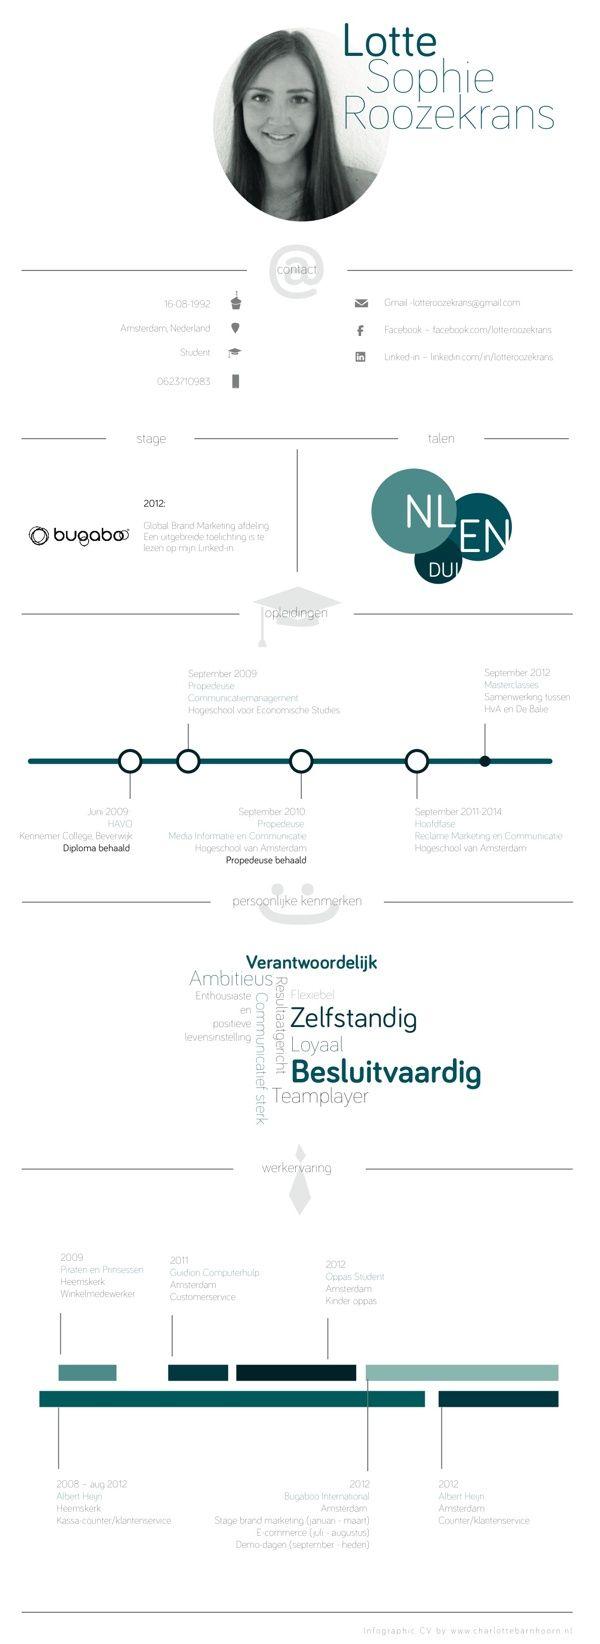 Curriculum Vitae by Lotte Sophie Roozekrans, via Behance